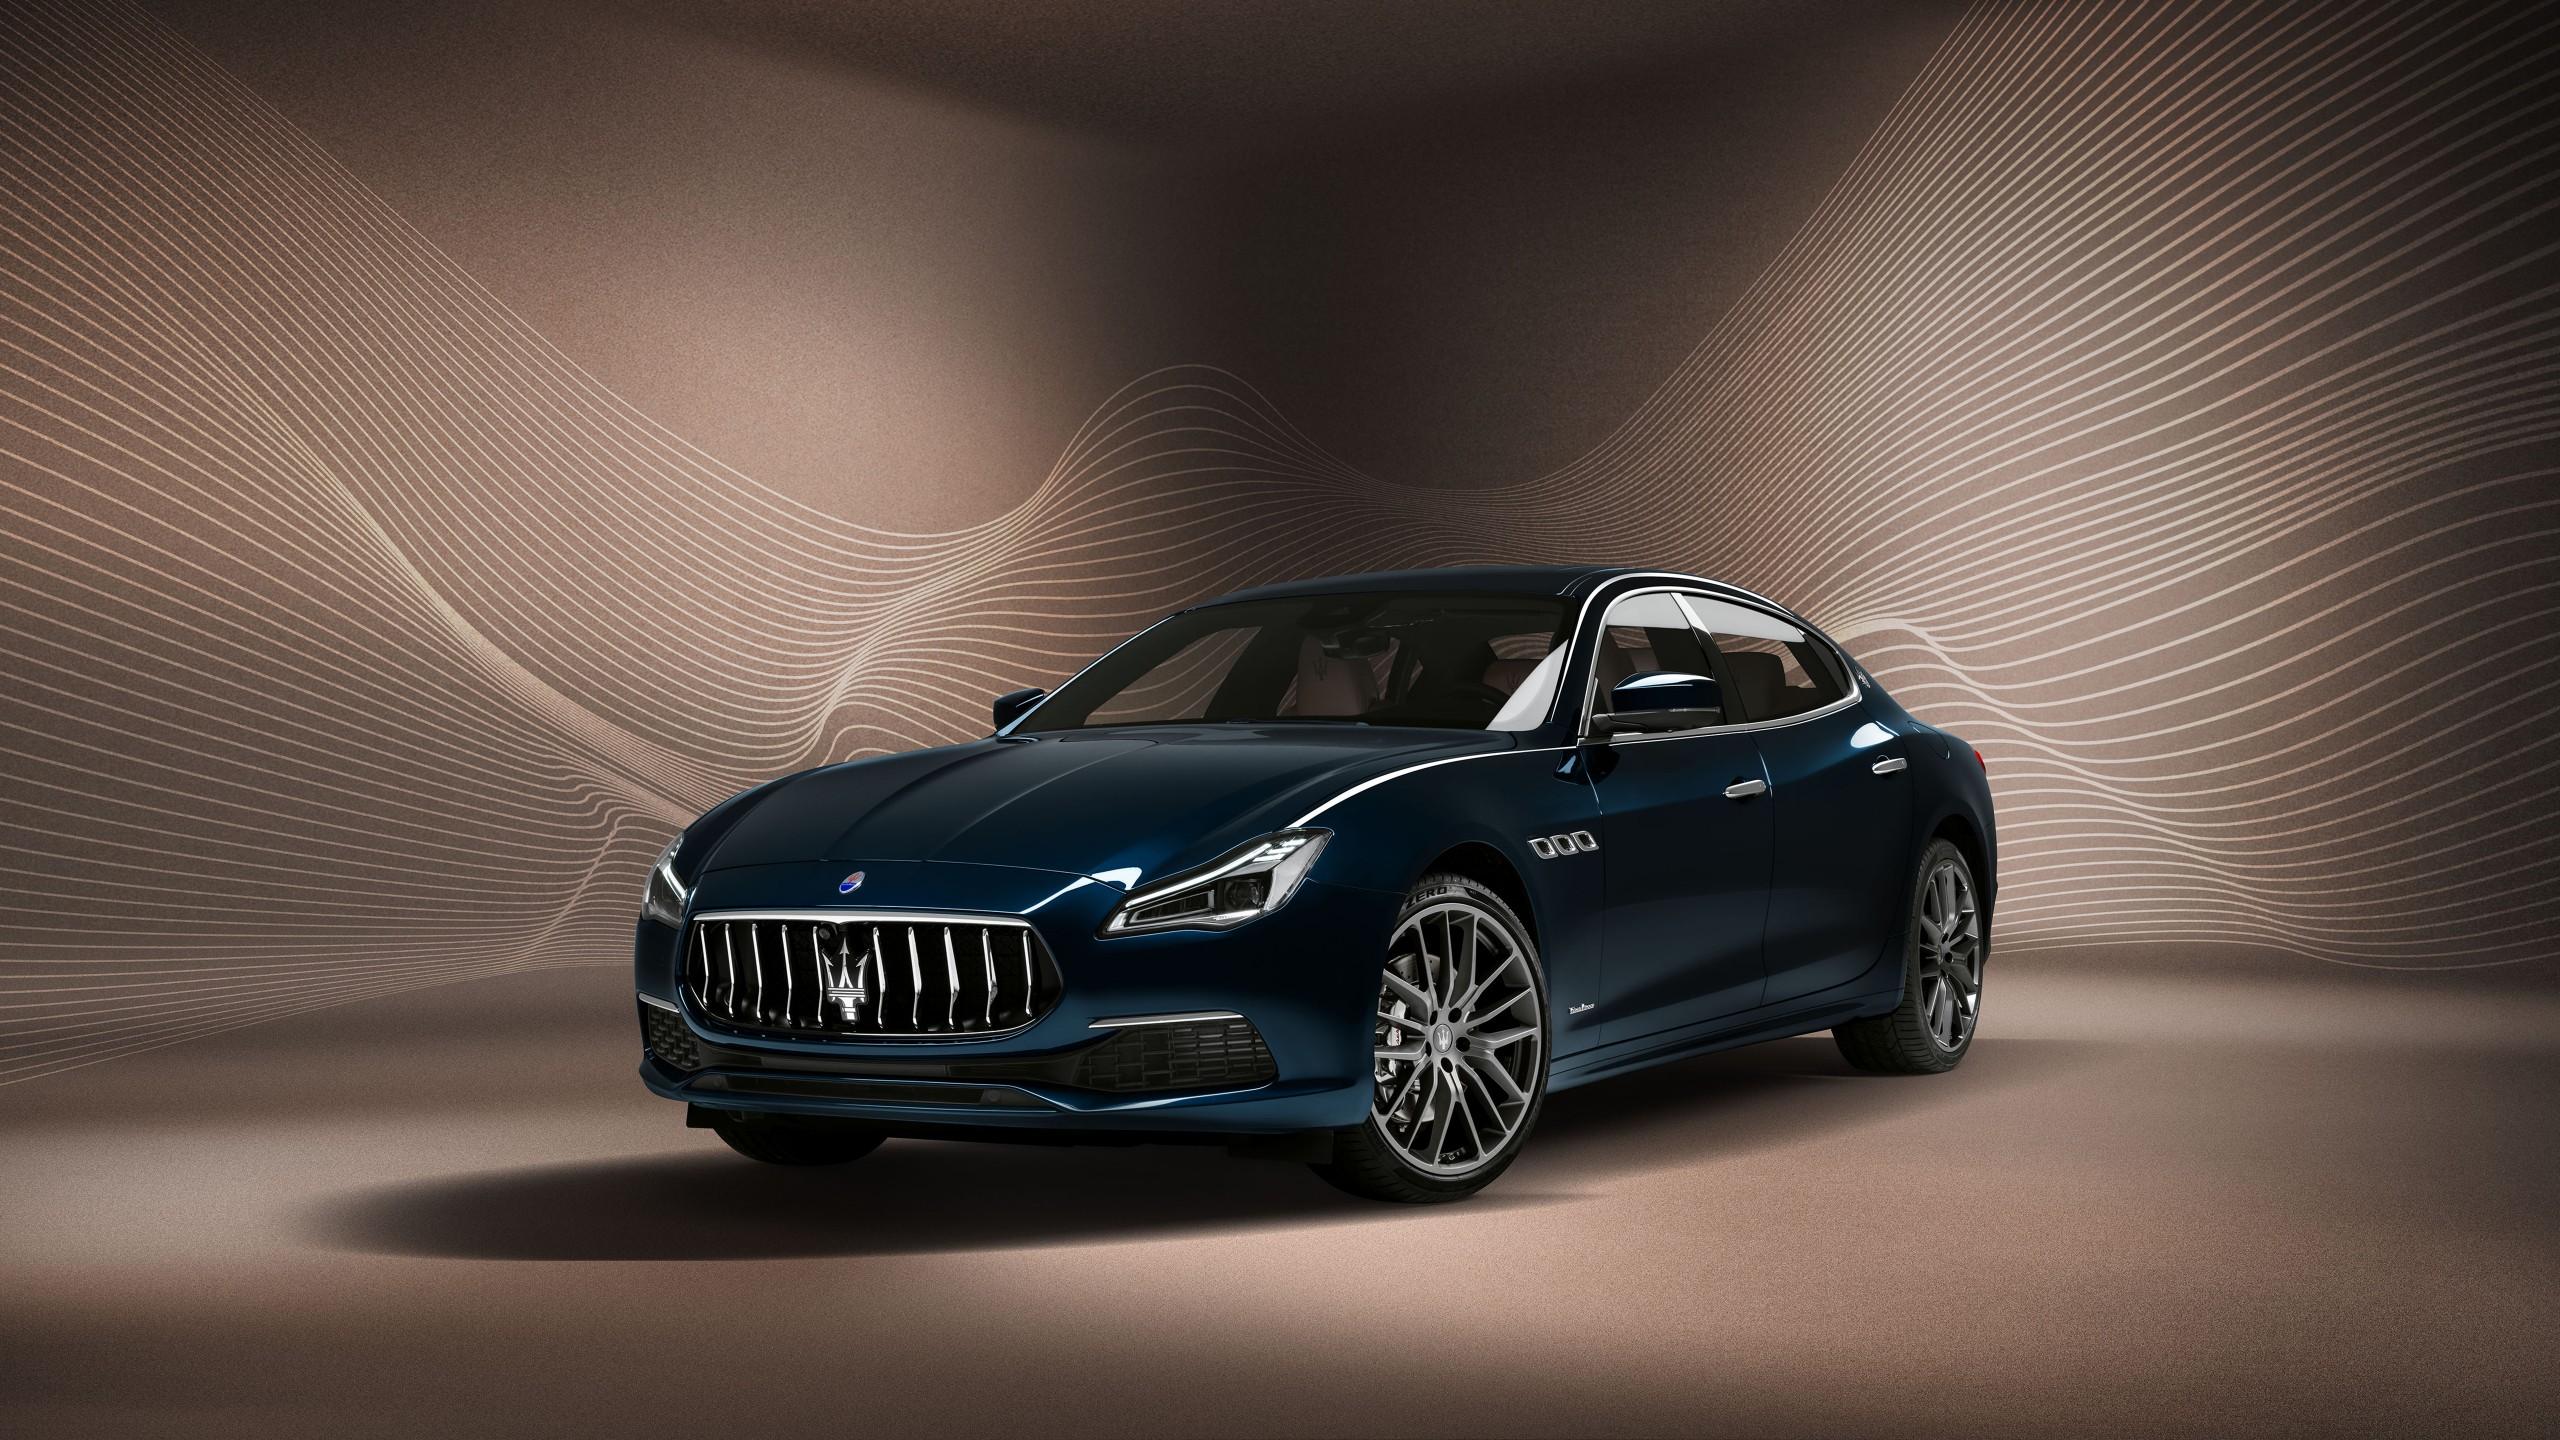 Maserati Quattroporte GranLusso Royale 2020 5K Wallpaper HD Car 2560x1440